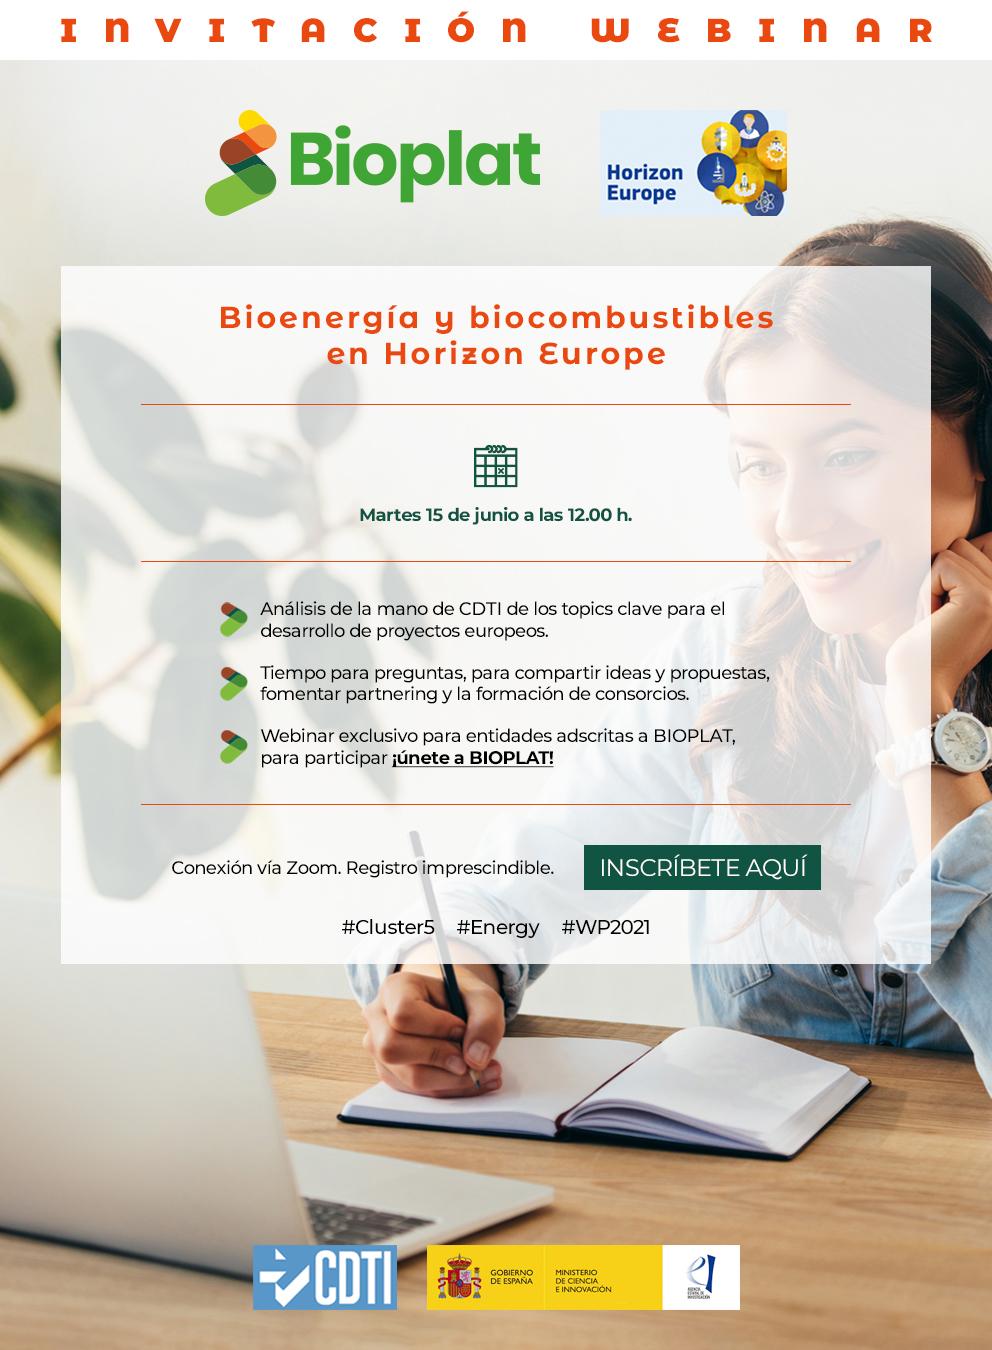 Webinar BIOPLAT / CDTI 'Bioenergía y biocombustibles en Horizon Europe' (15 junio, 12h)